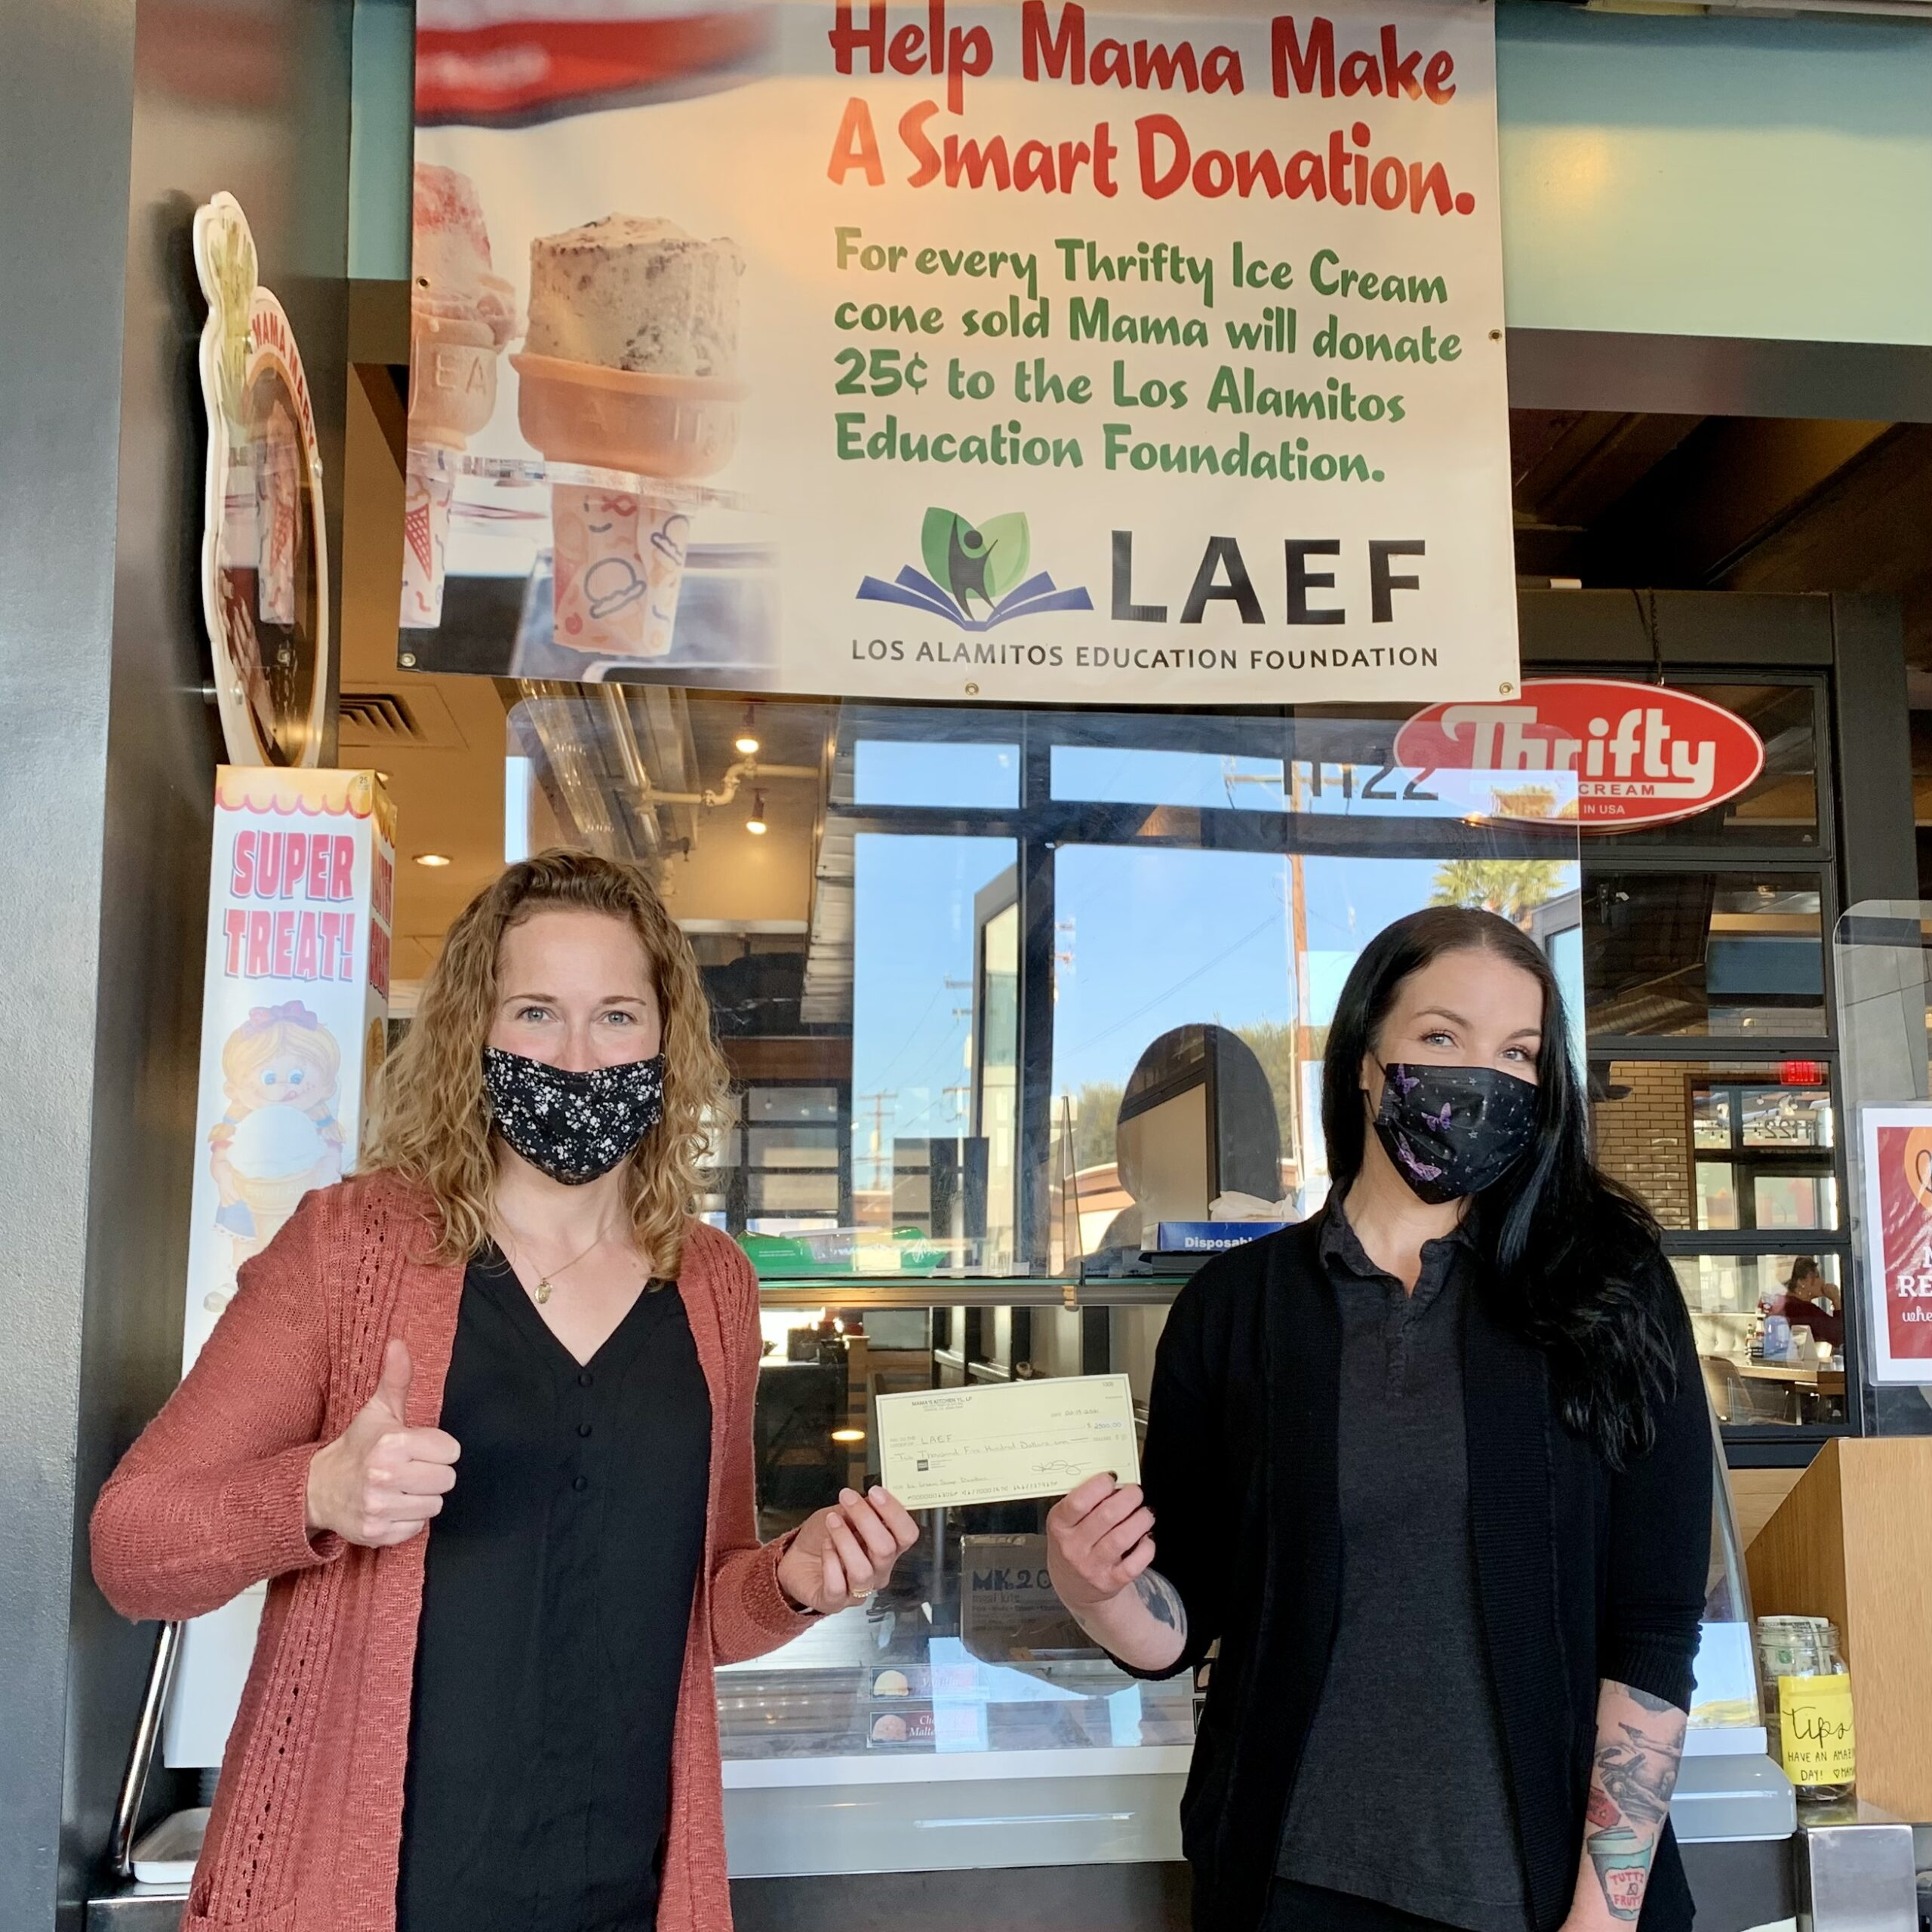 Mama's Donates $2,500 to LAEF!